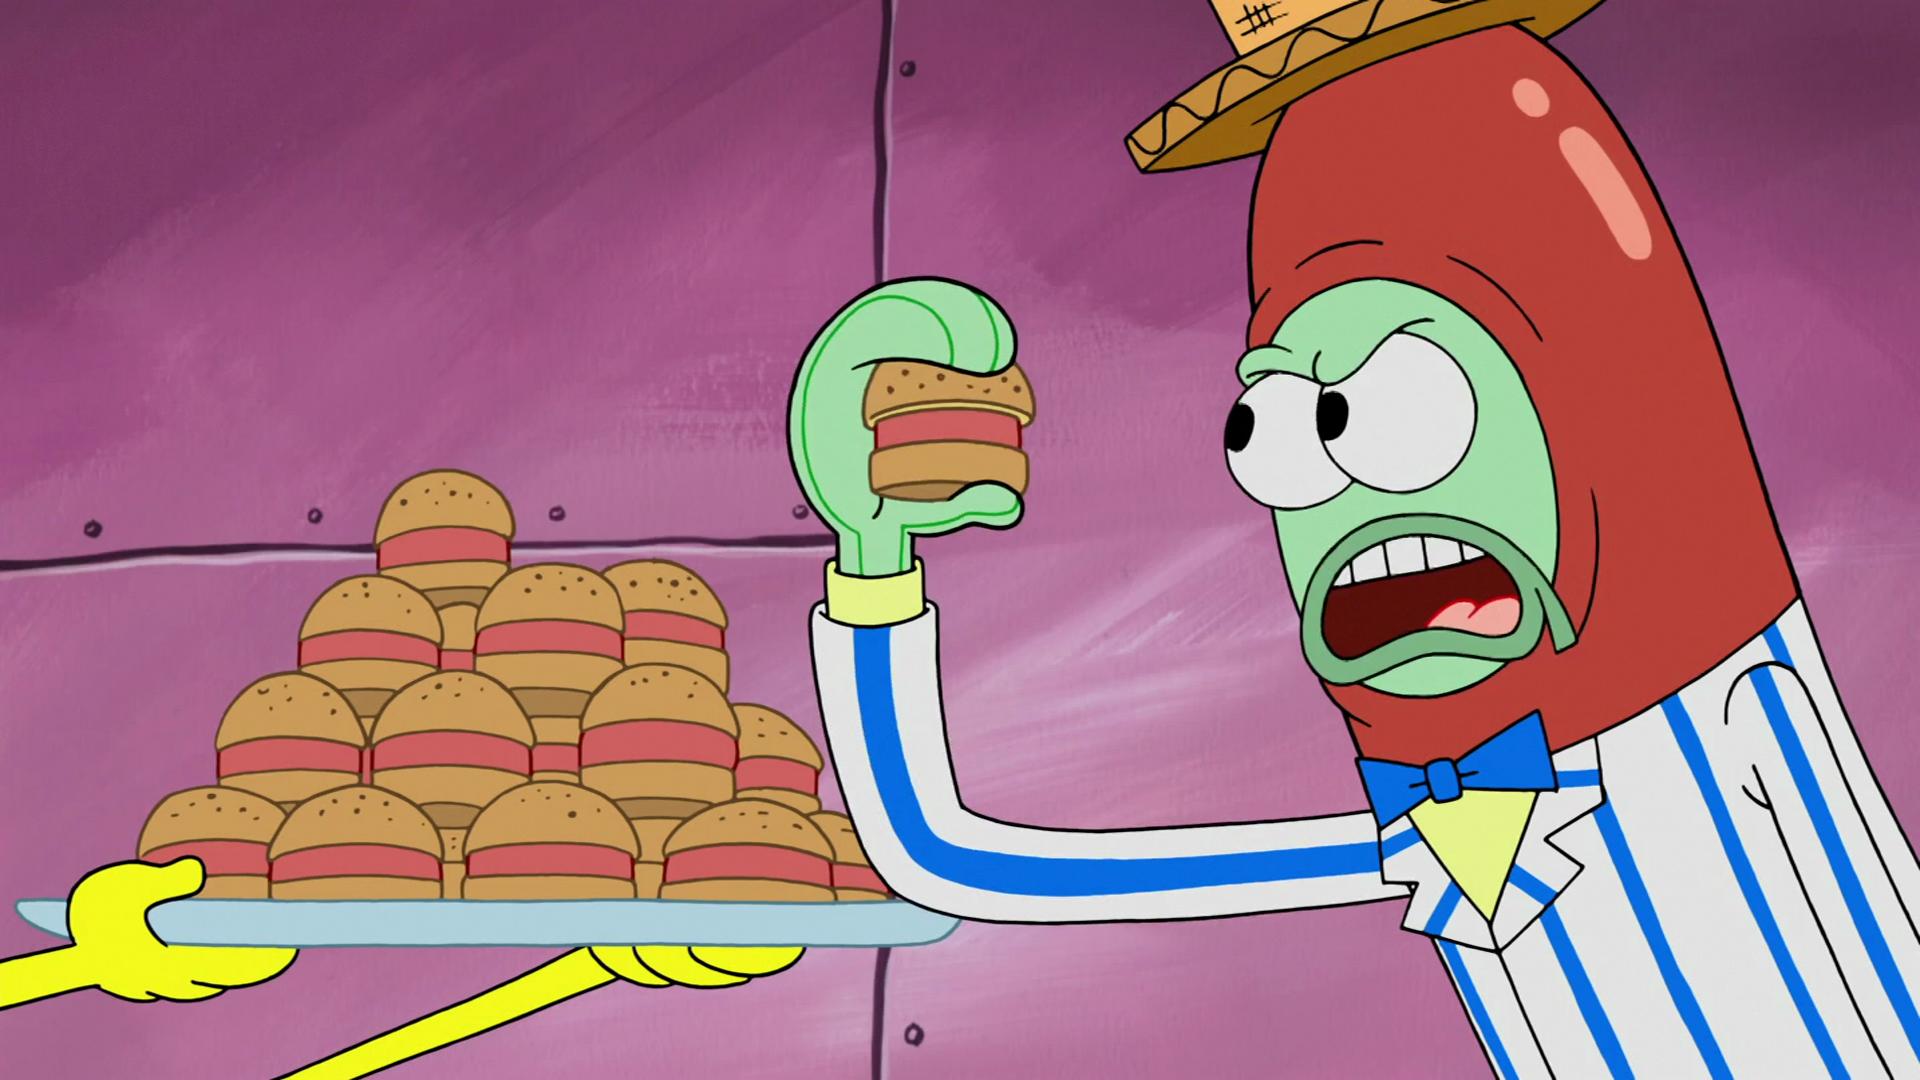 Weenie Patty